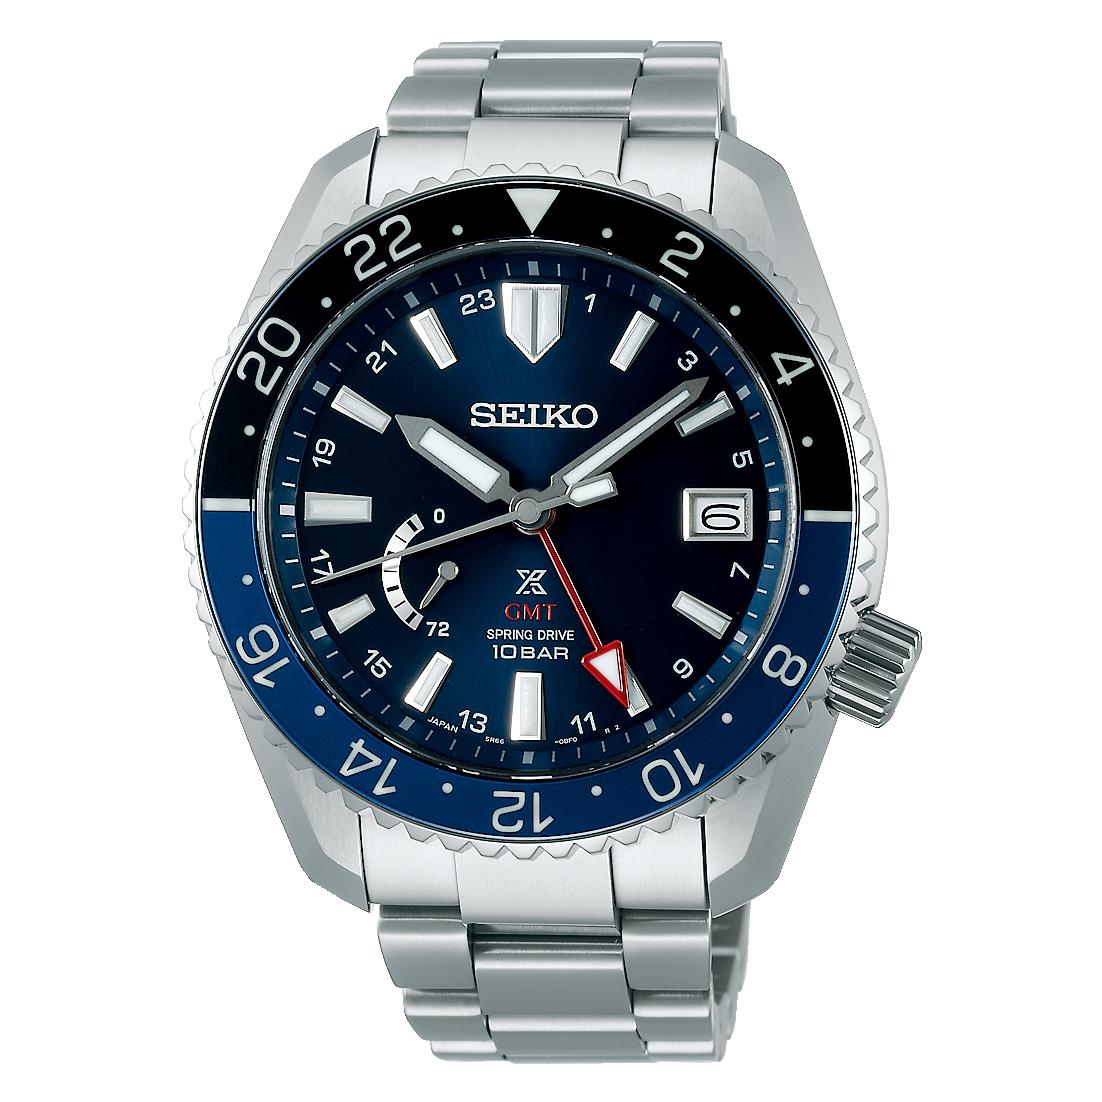 Seiko Prospex LX Line SNR033J1 GMT Spring Drive Diver aus Titan mit Saphirglas